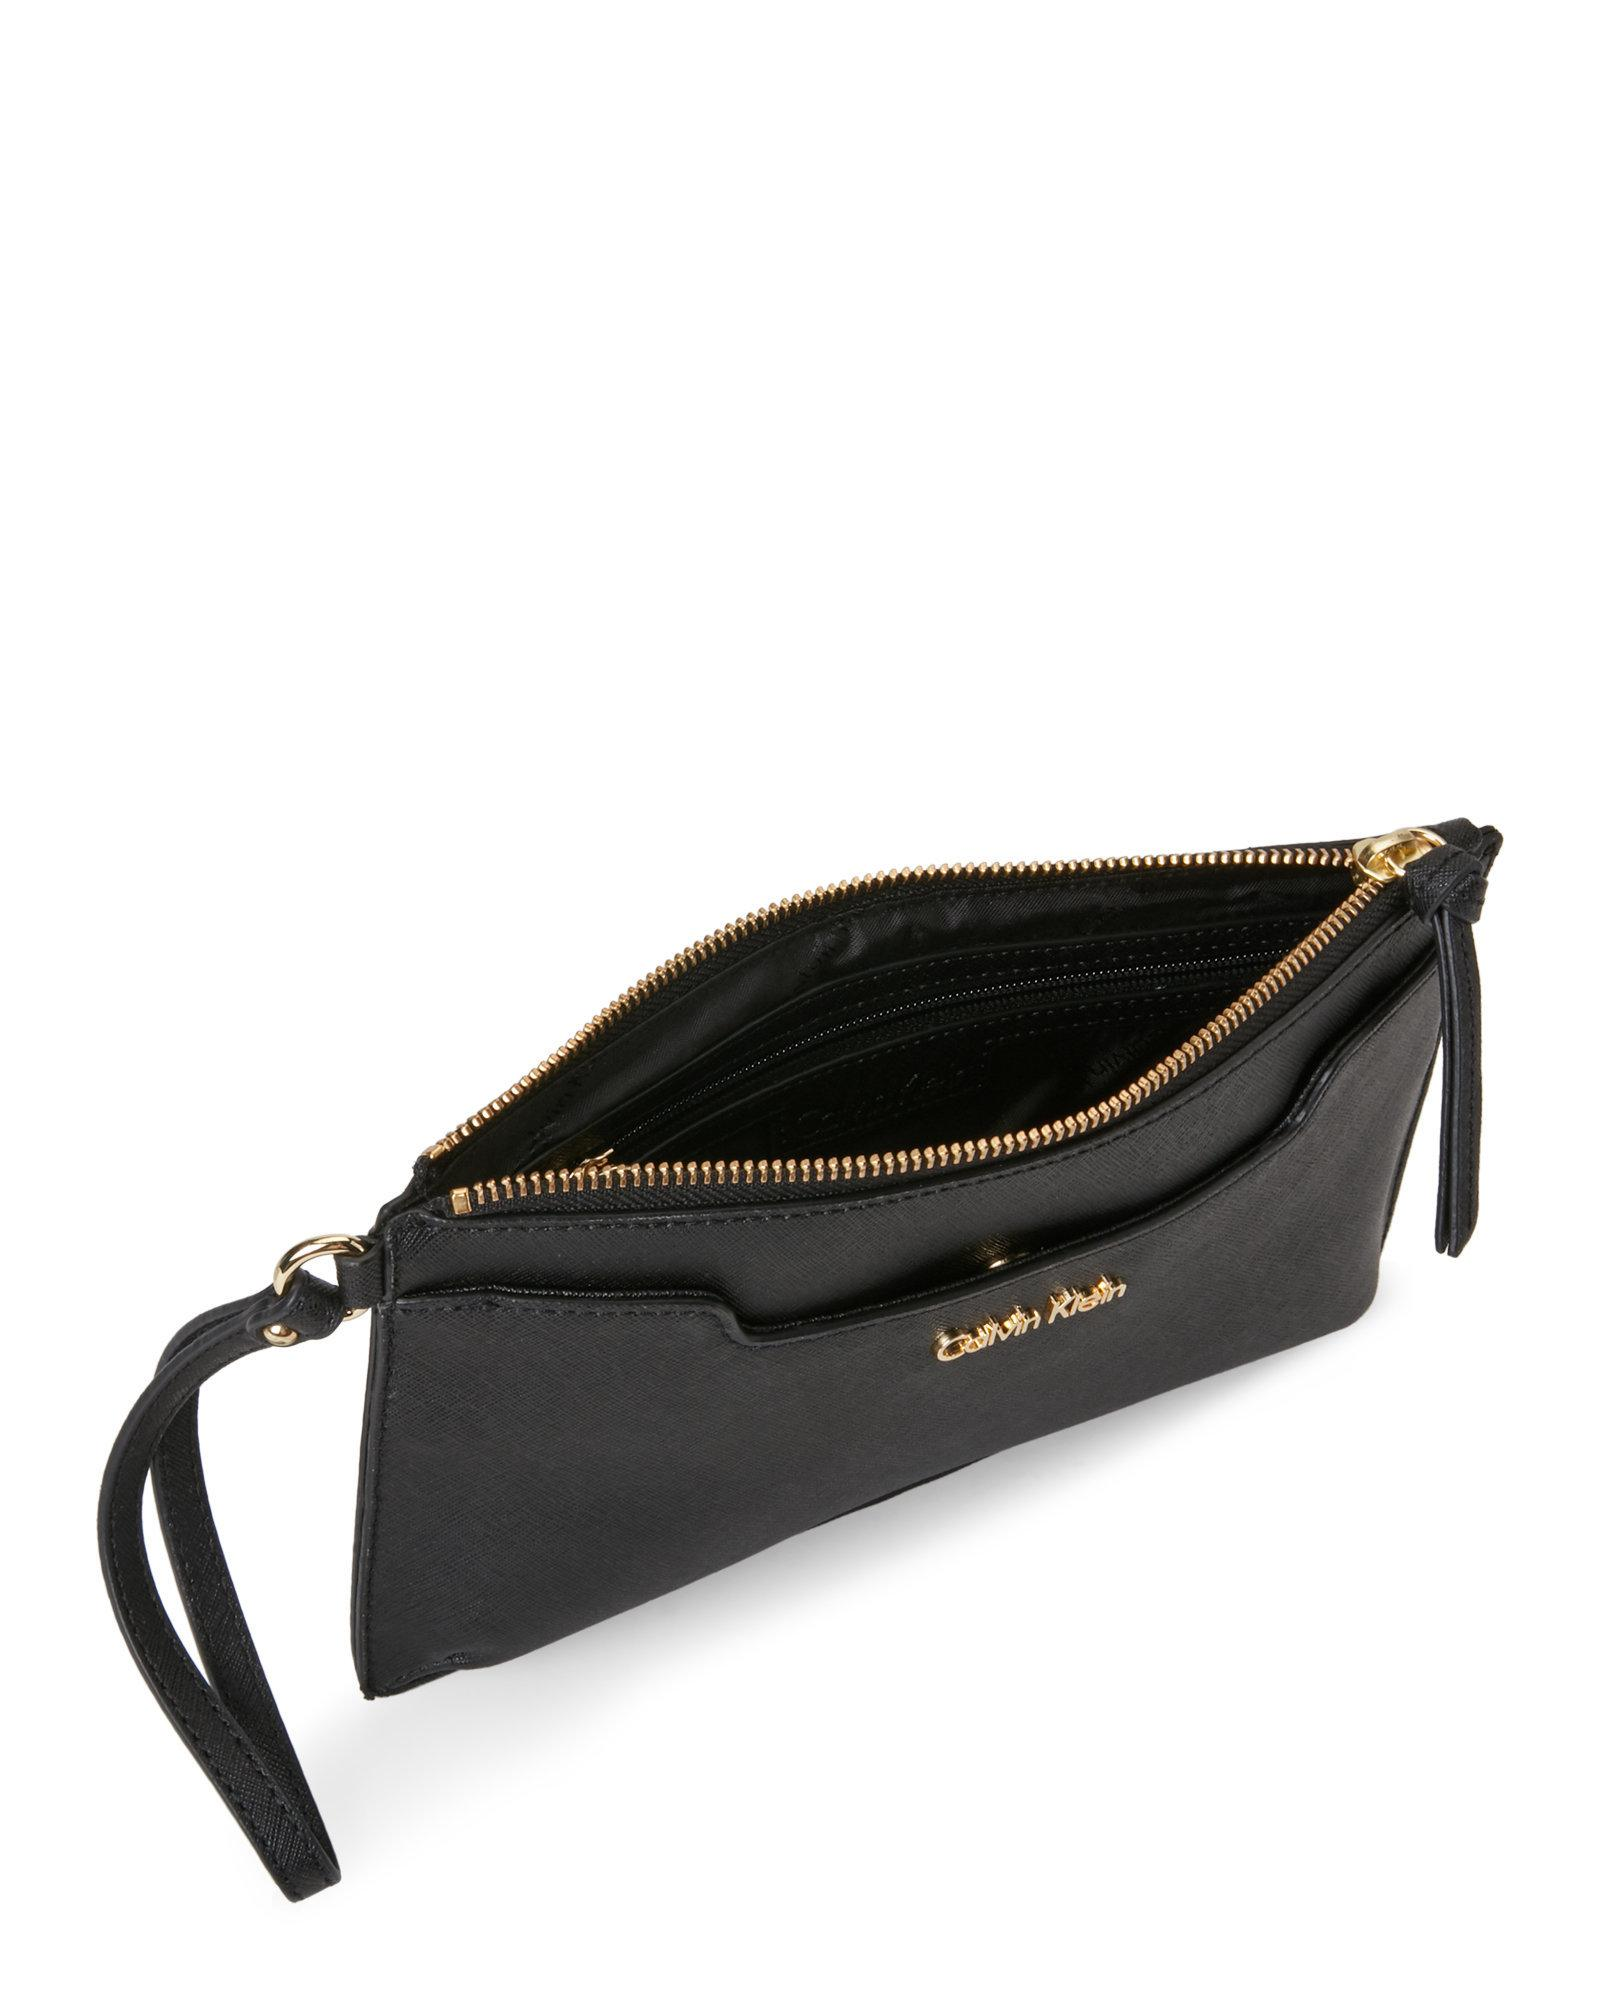 21ba901ad9 Calvin Klein Black Saffiano Leather Wristlet in Black - Lyst